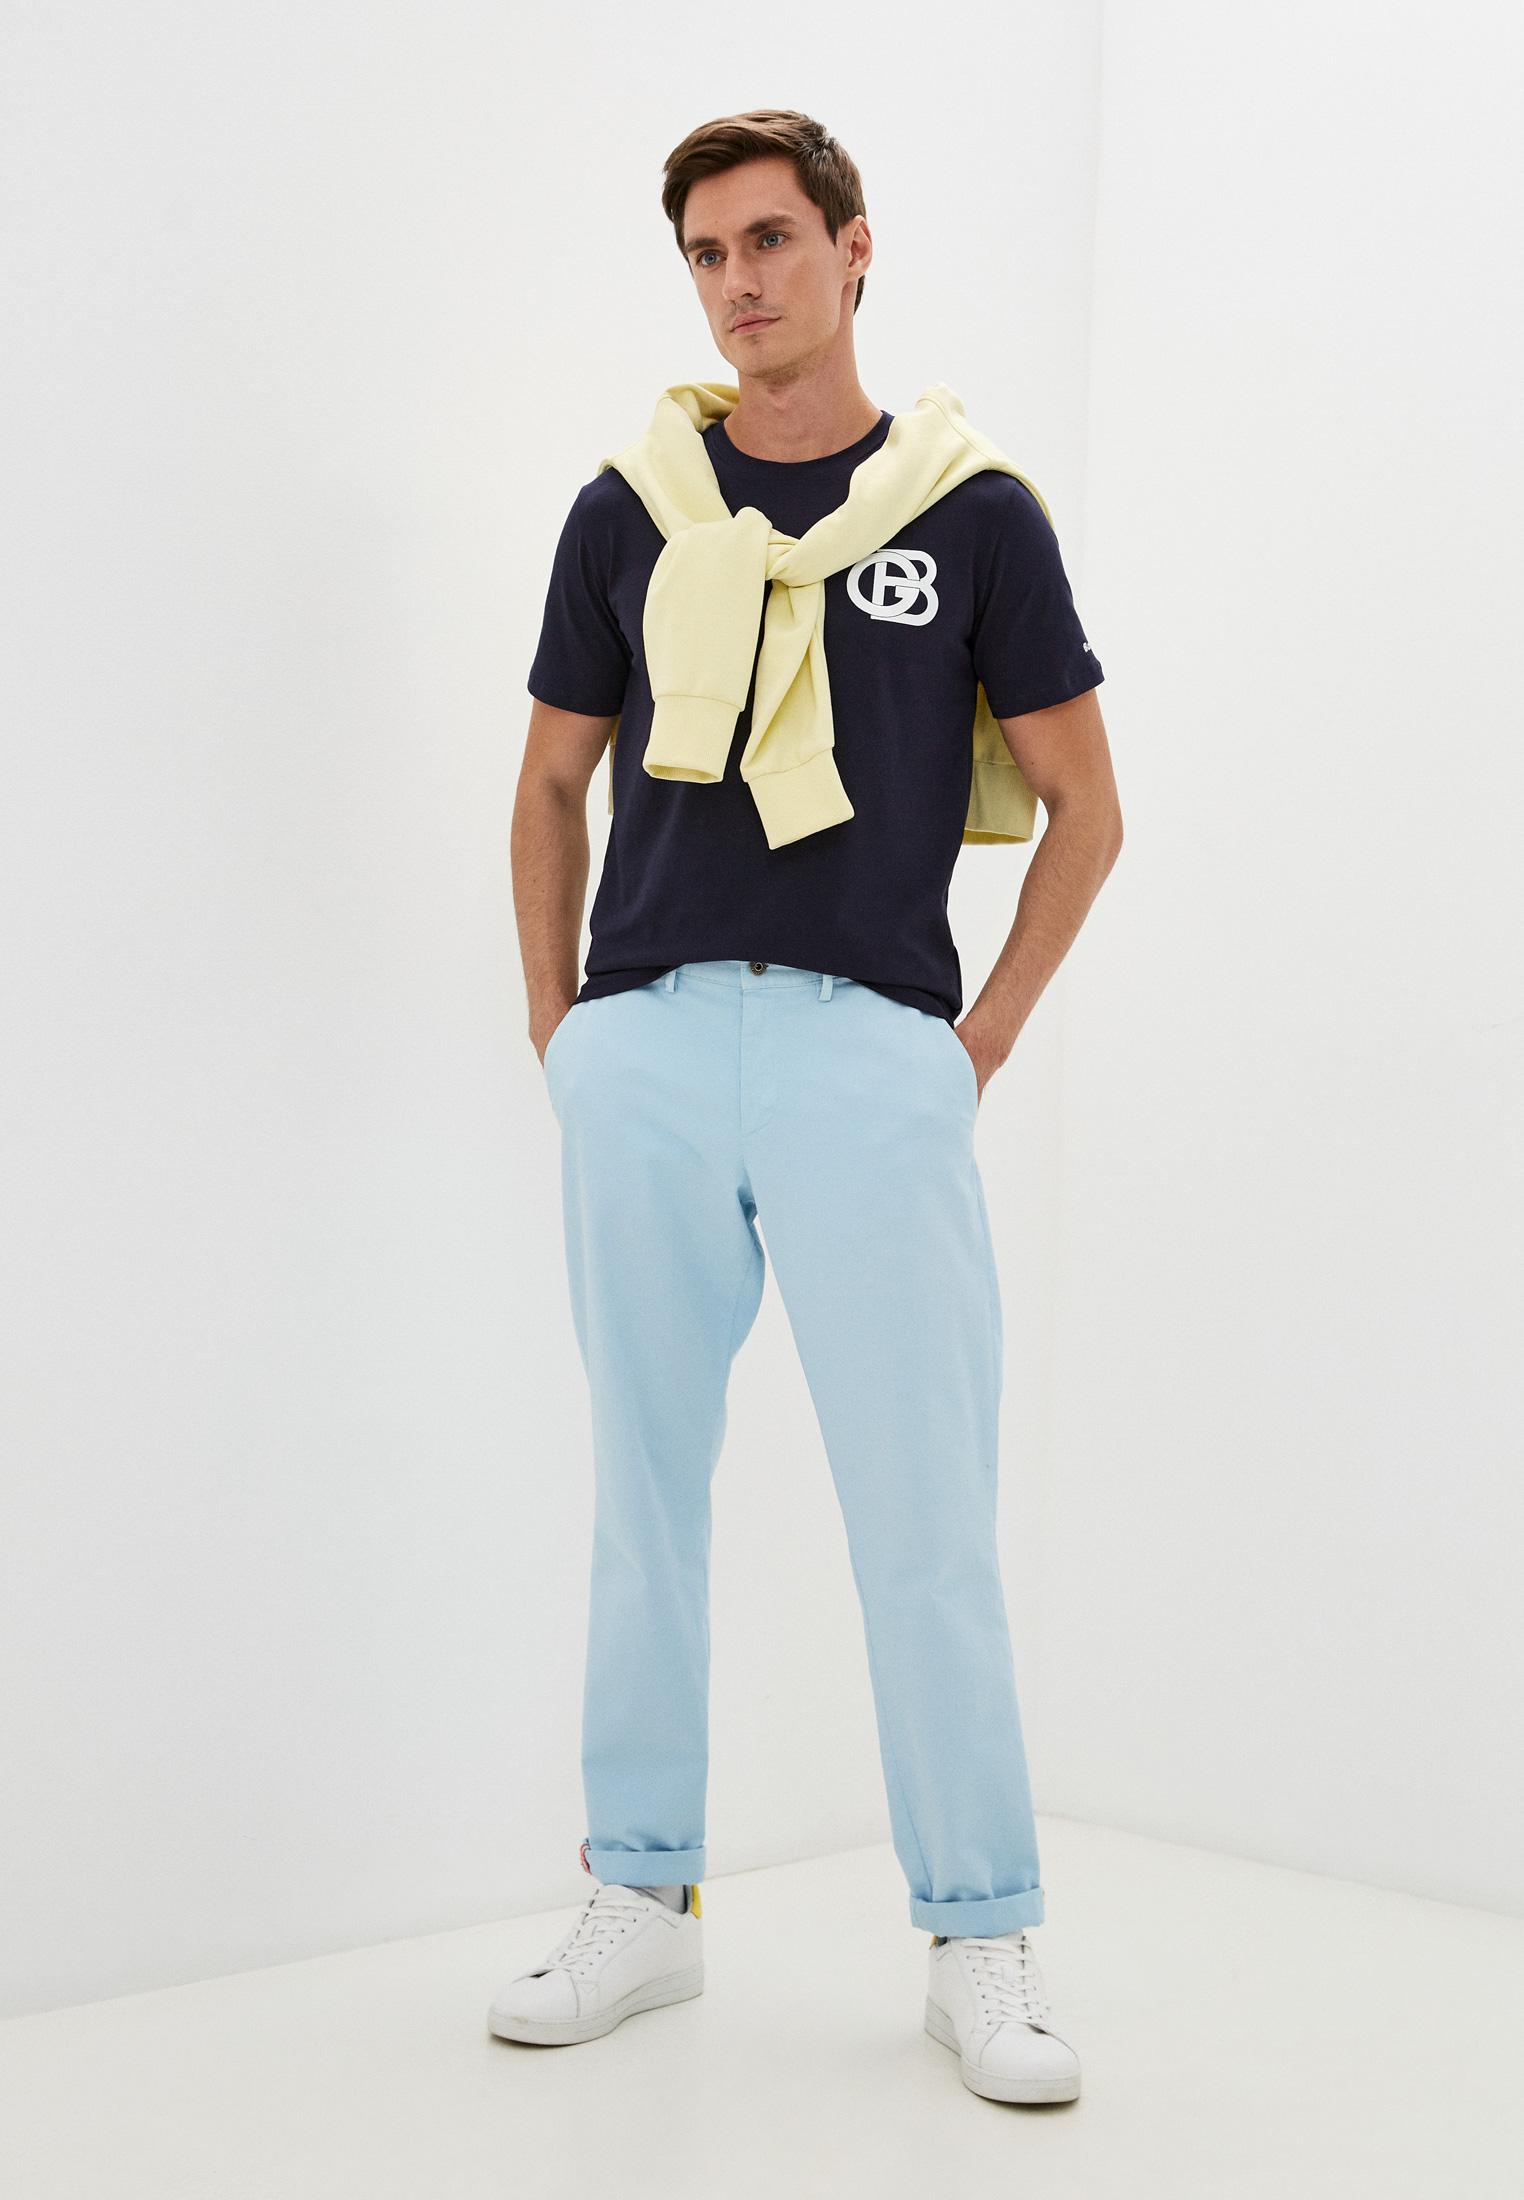 Мужская футболка Baldinini (Балдинини) TSU01: изображение 3